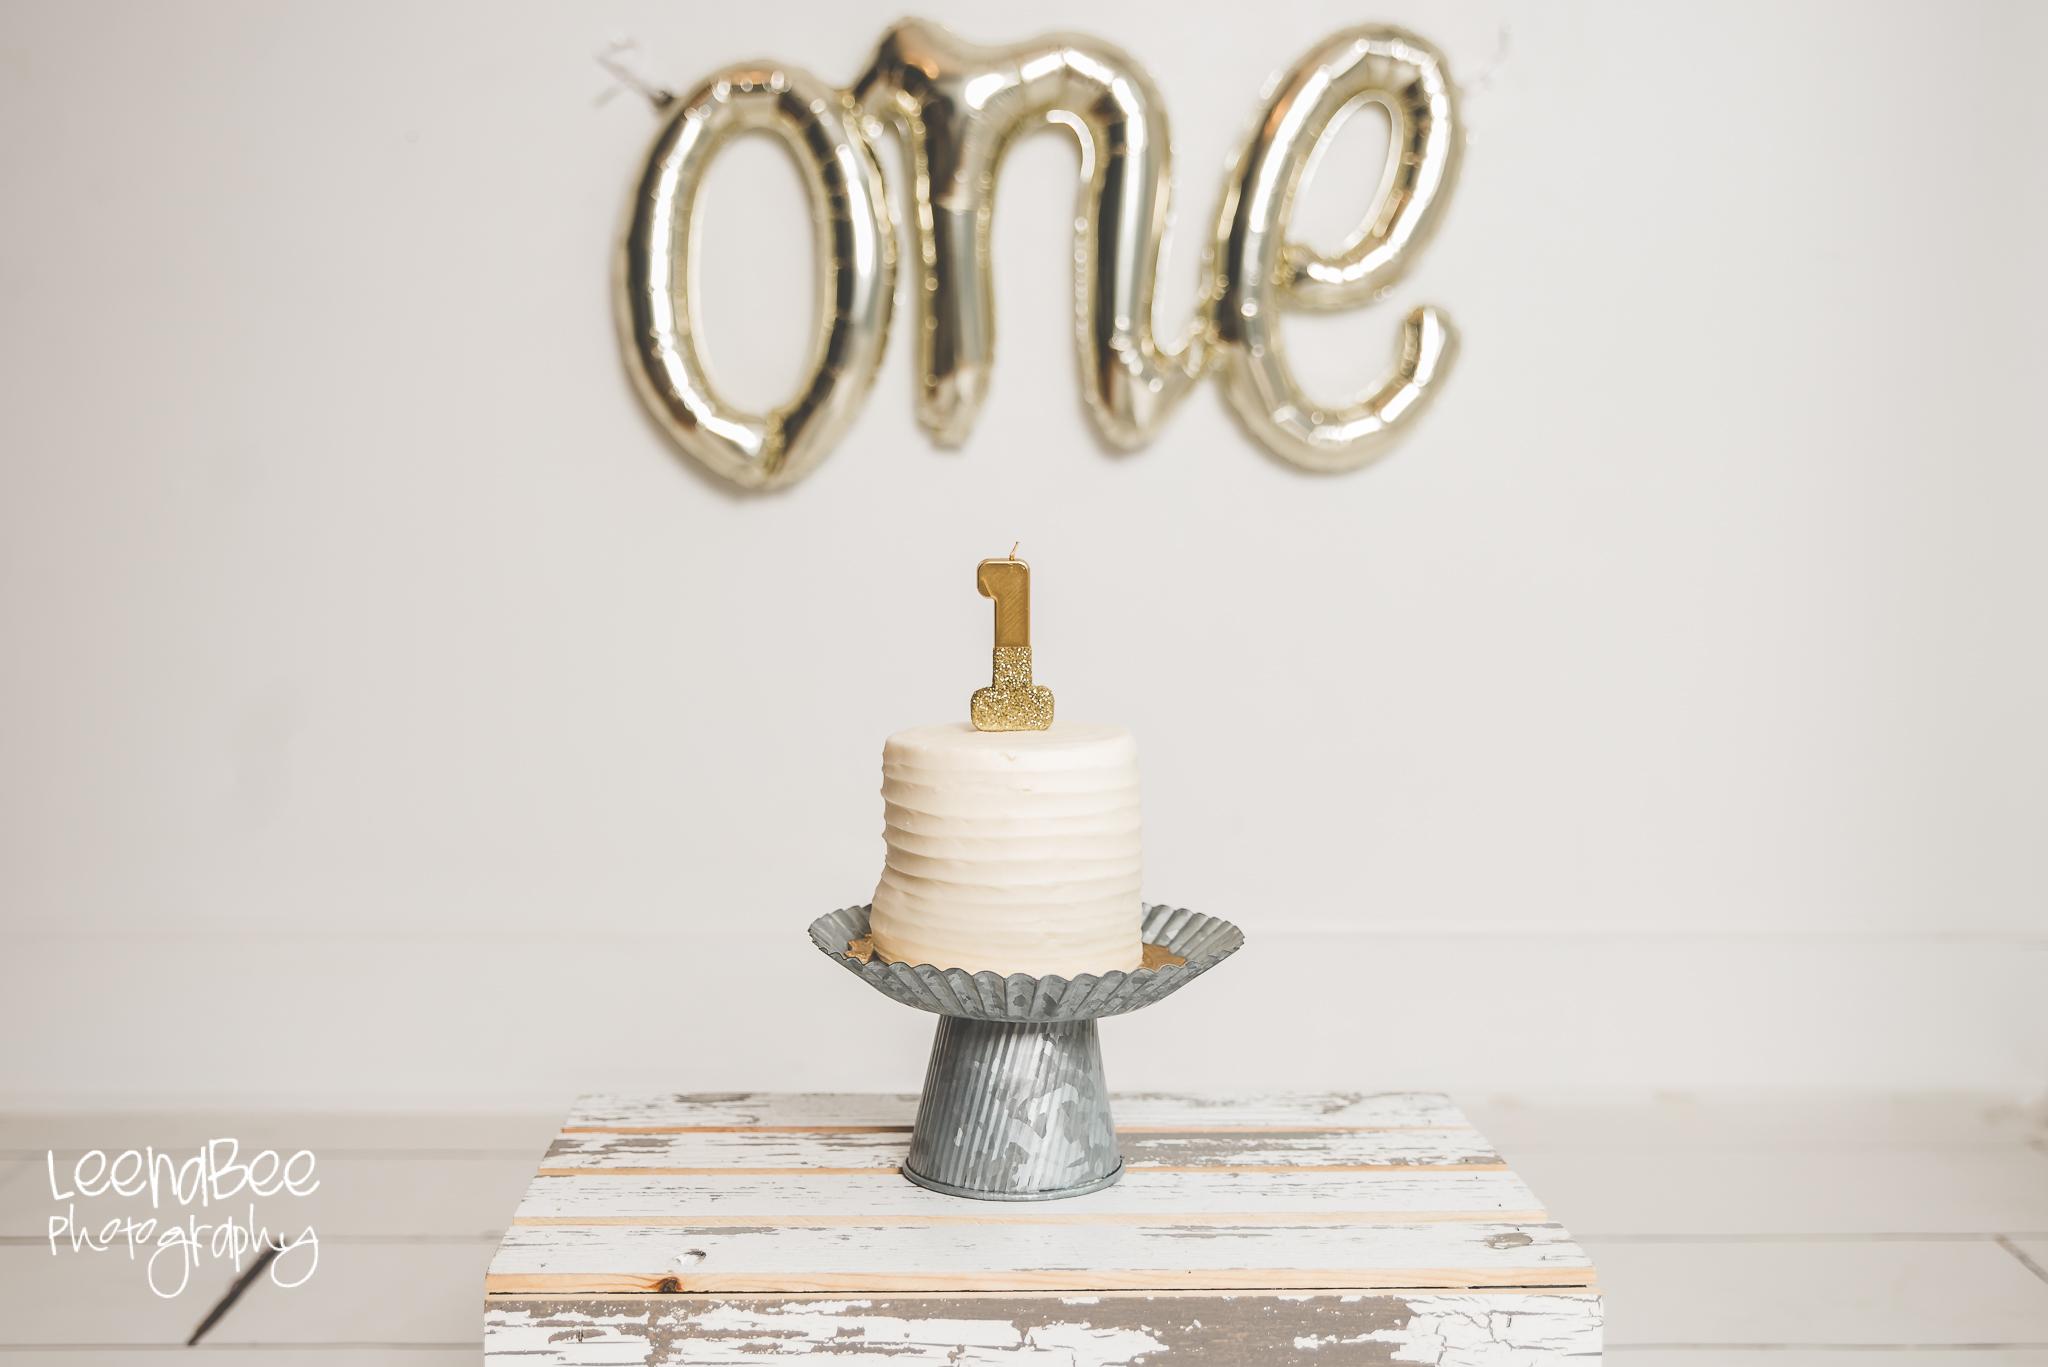 Dublin ohio first birthday cake smash photography-6